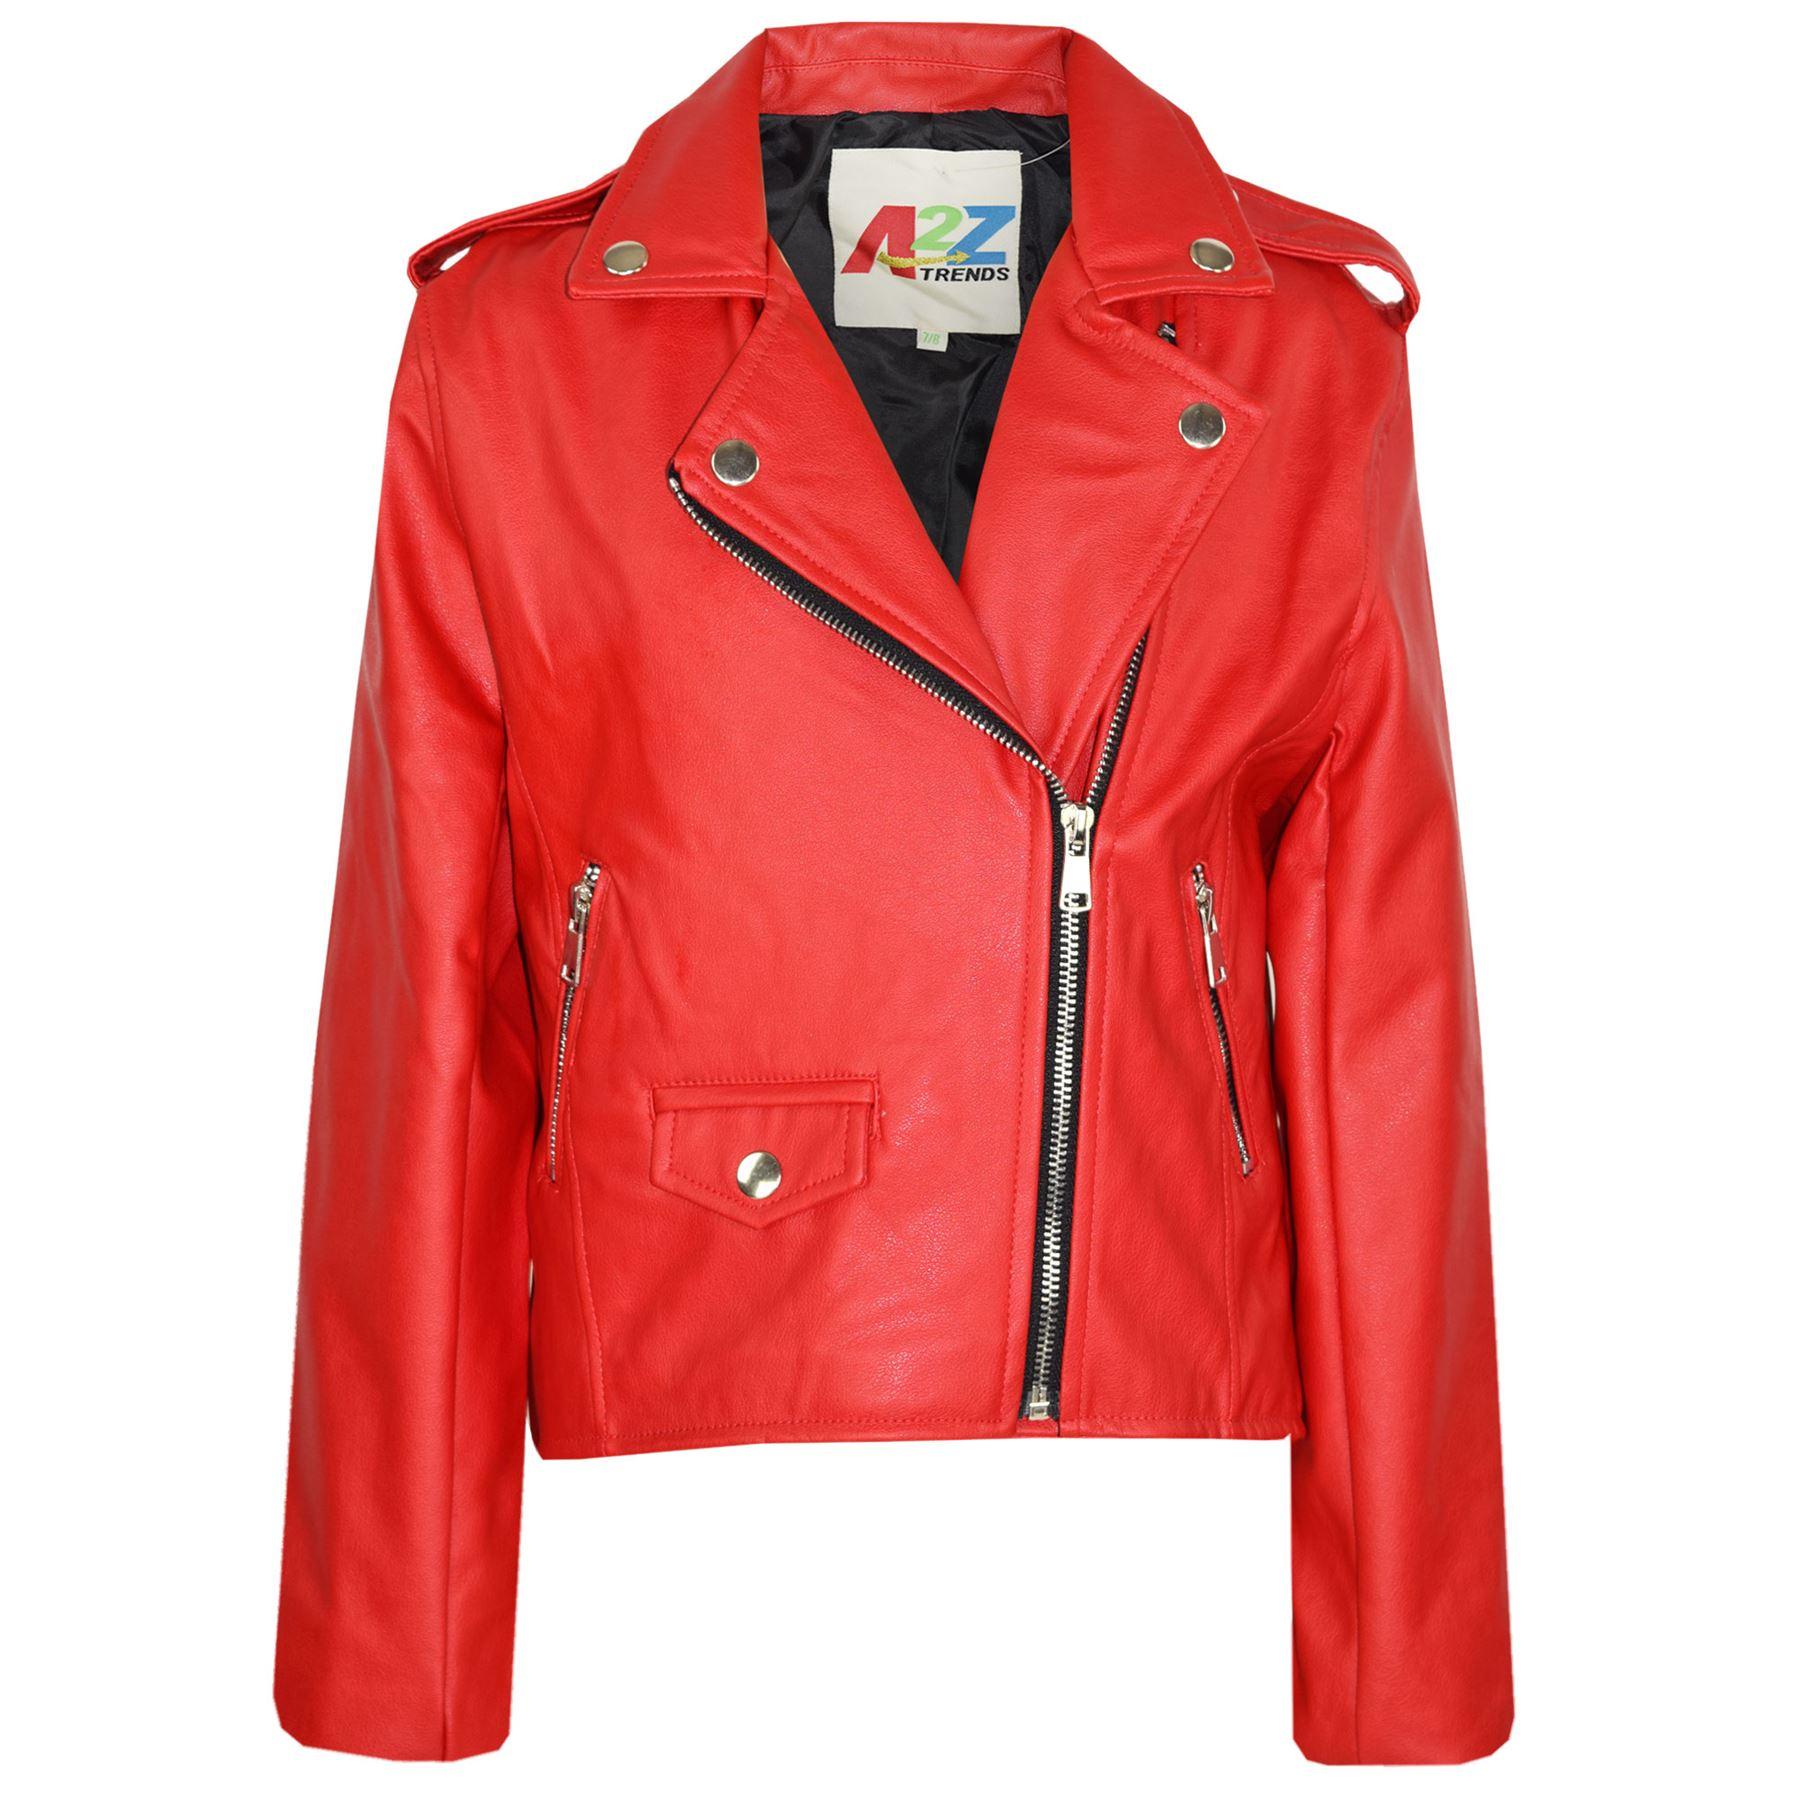 kids jackets girls designers pu leather jacket zip up